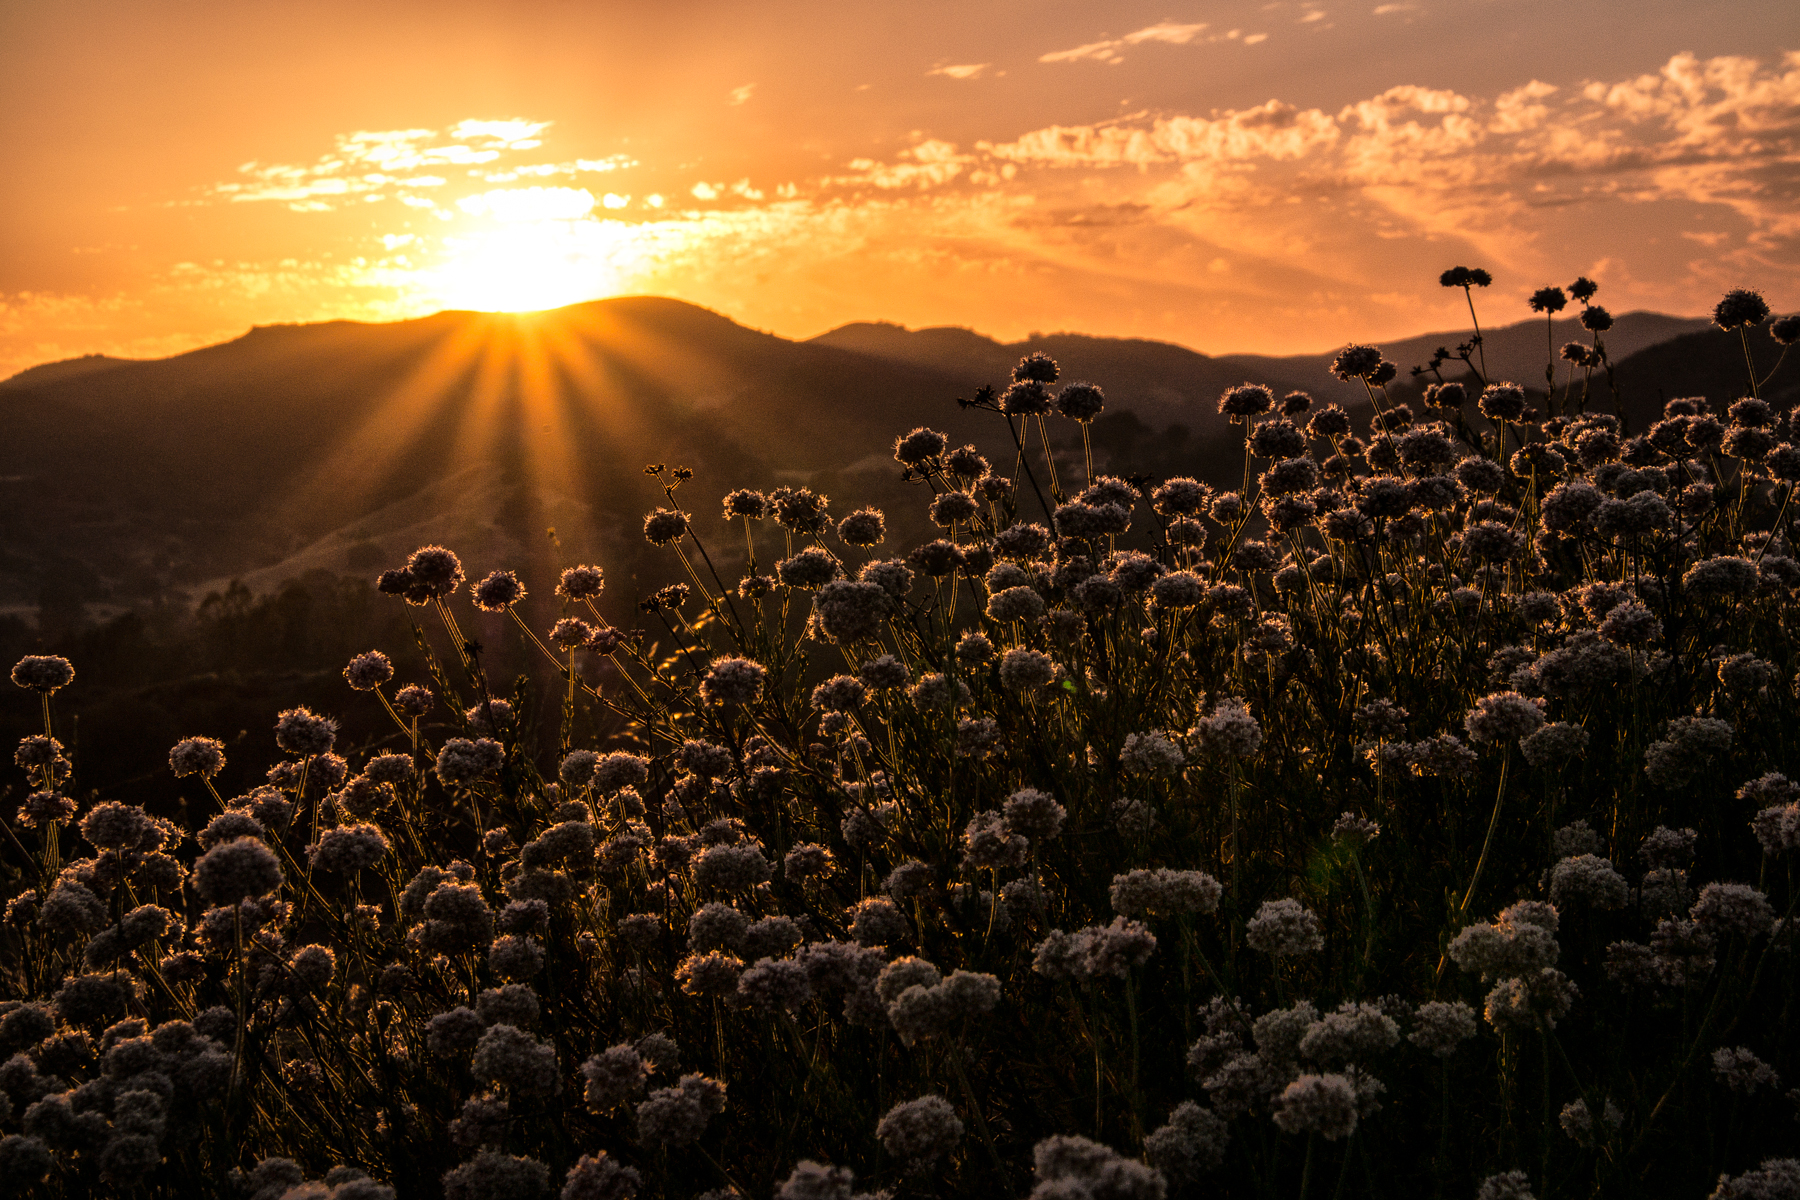 Wasim Muklashy Photography_Summer Solstice_Sunset_062114_Agoura Hills_California_Samsung NX30